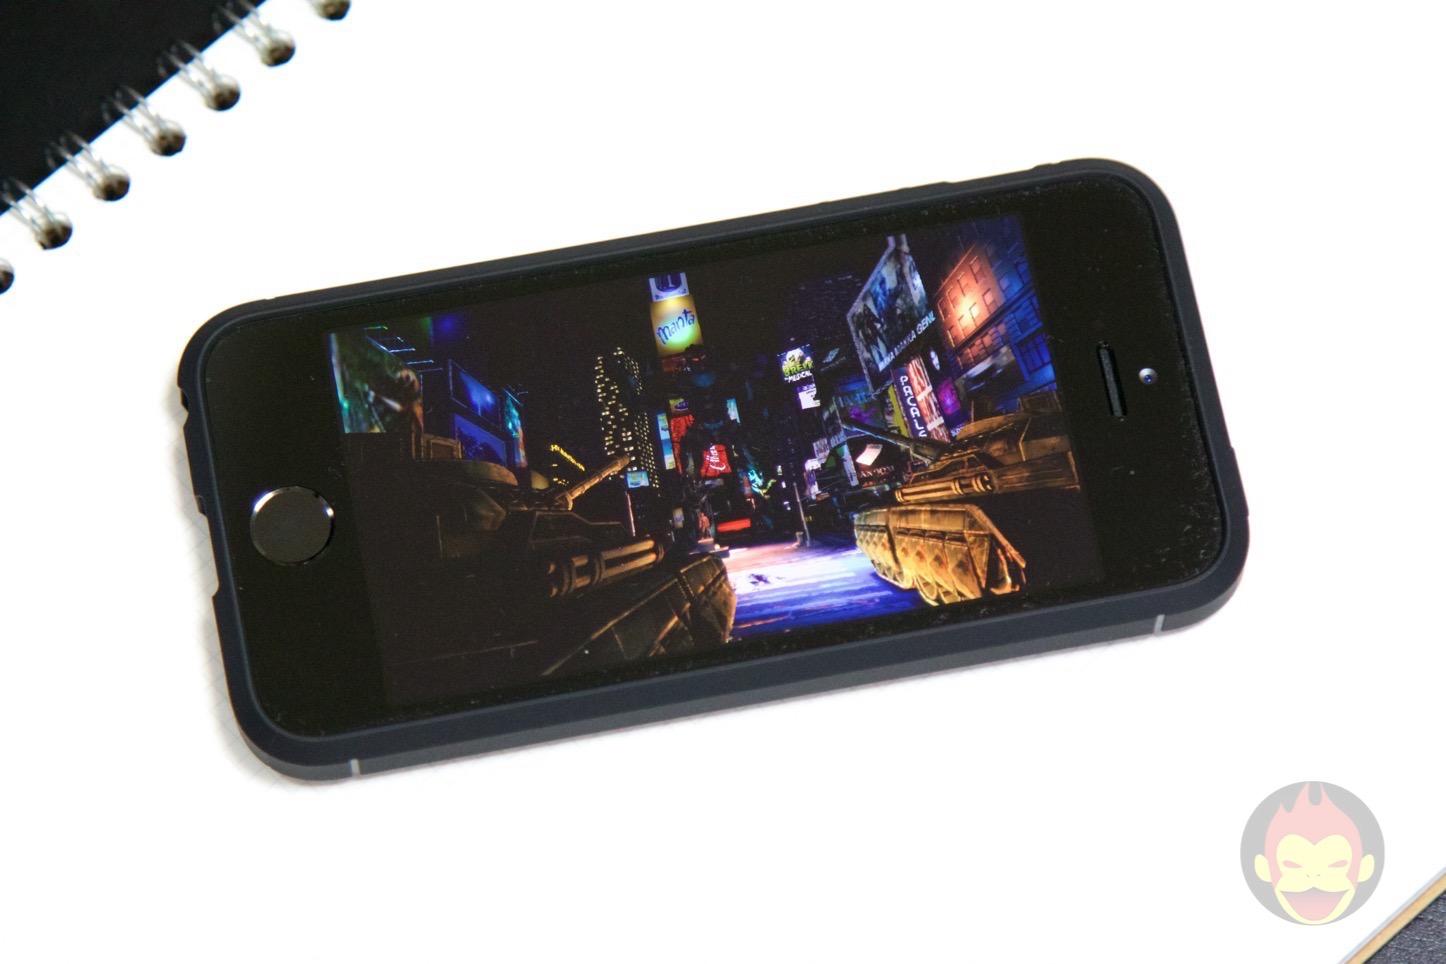 IPhone SE Benchmark Testing